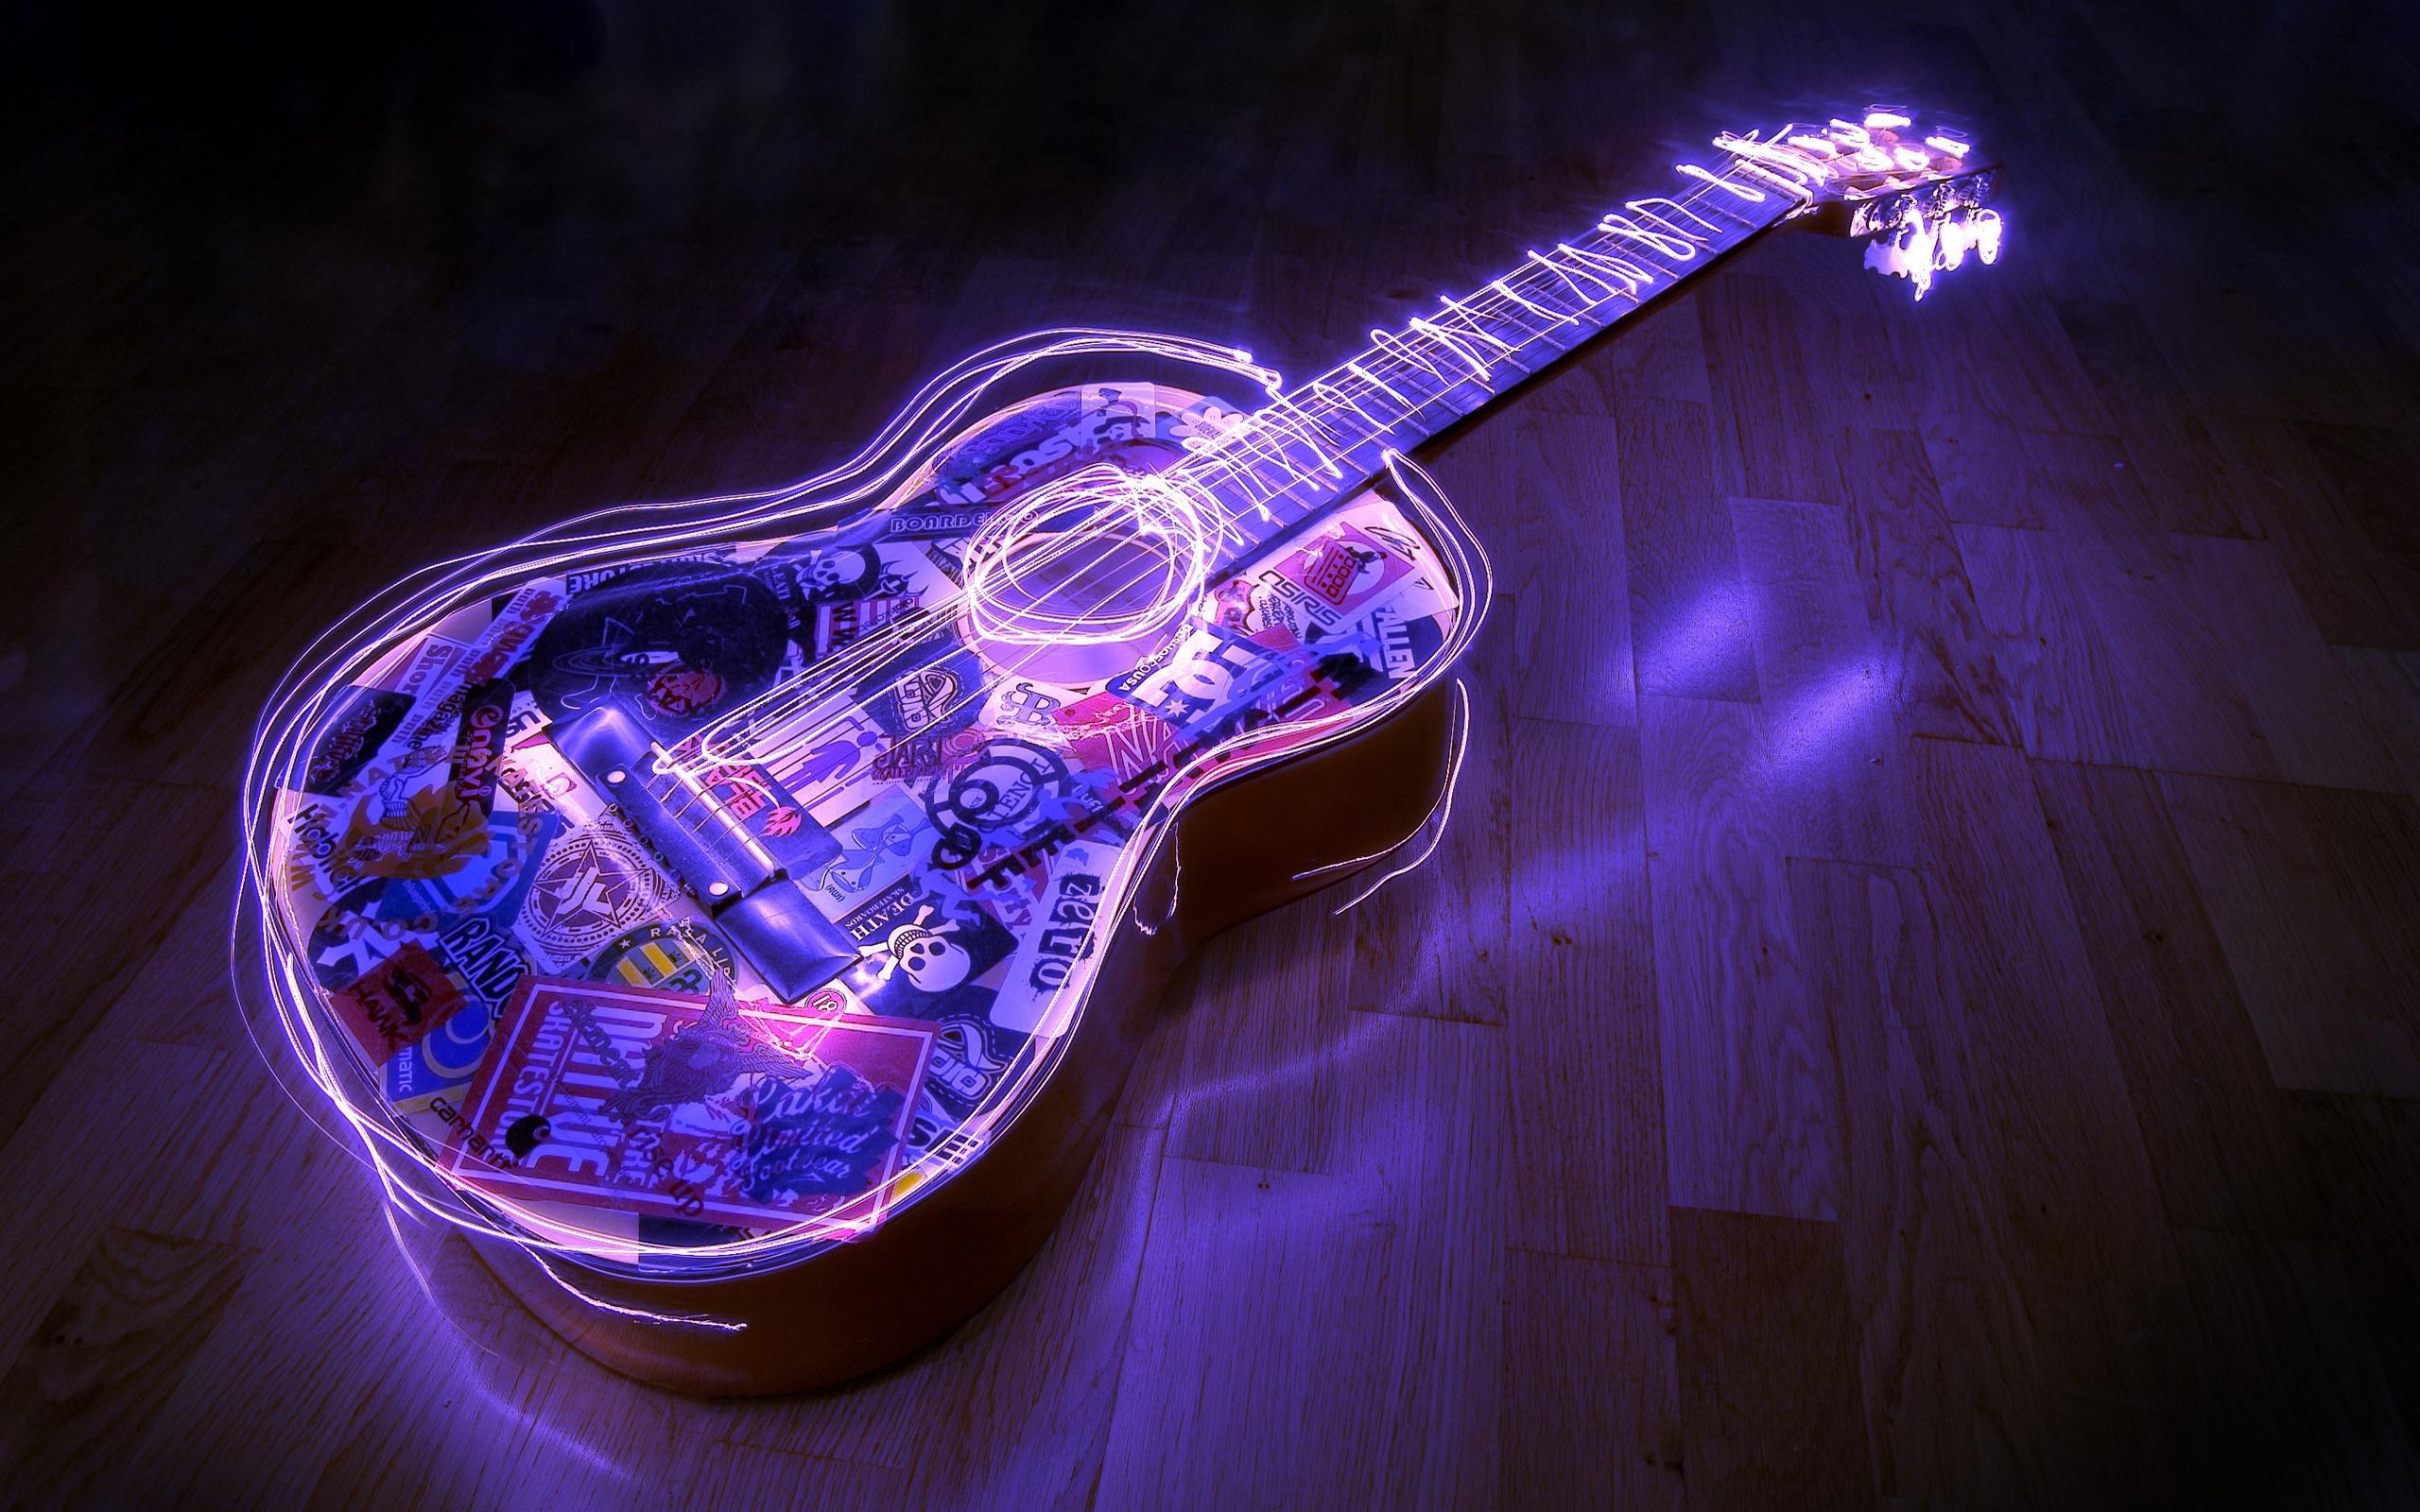 New guitar image